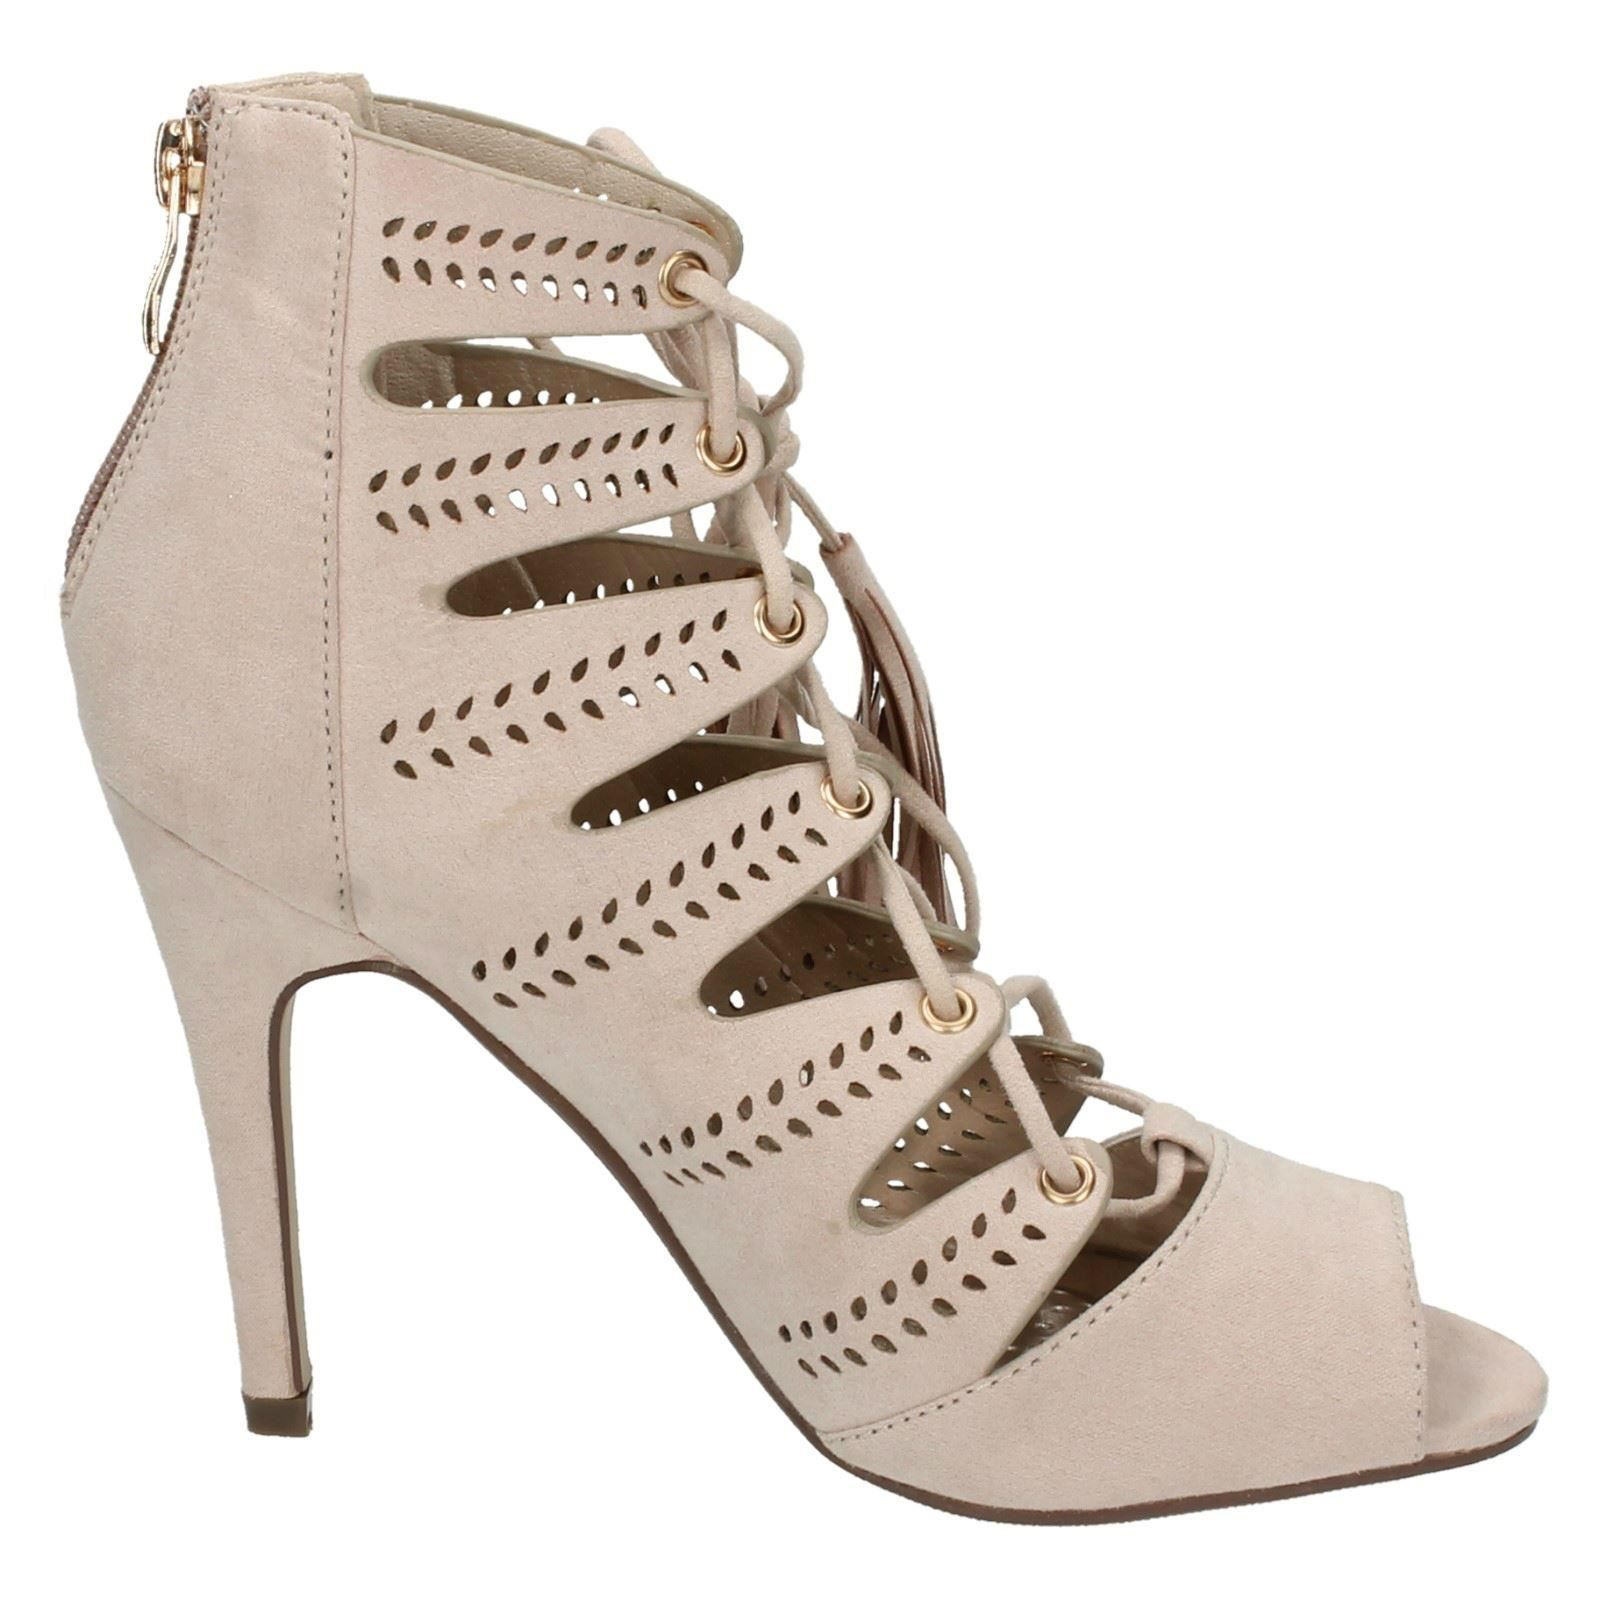 Kidderminster FootwearF10475 - Sandali Donna, Beige (Beige (Marroncino)), 41